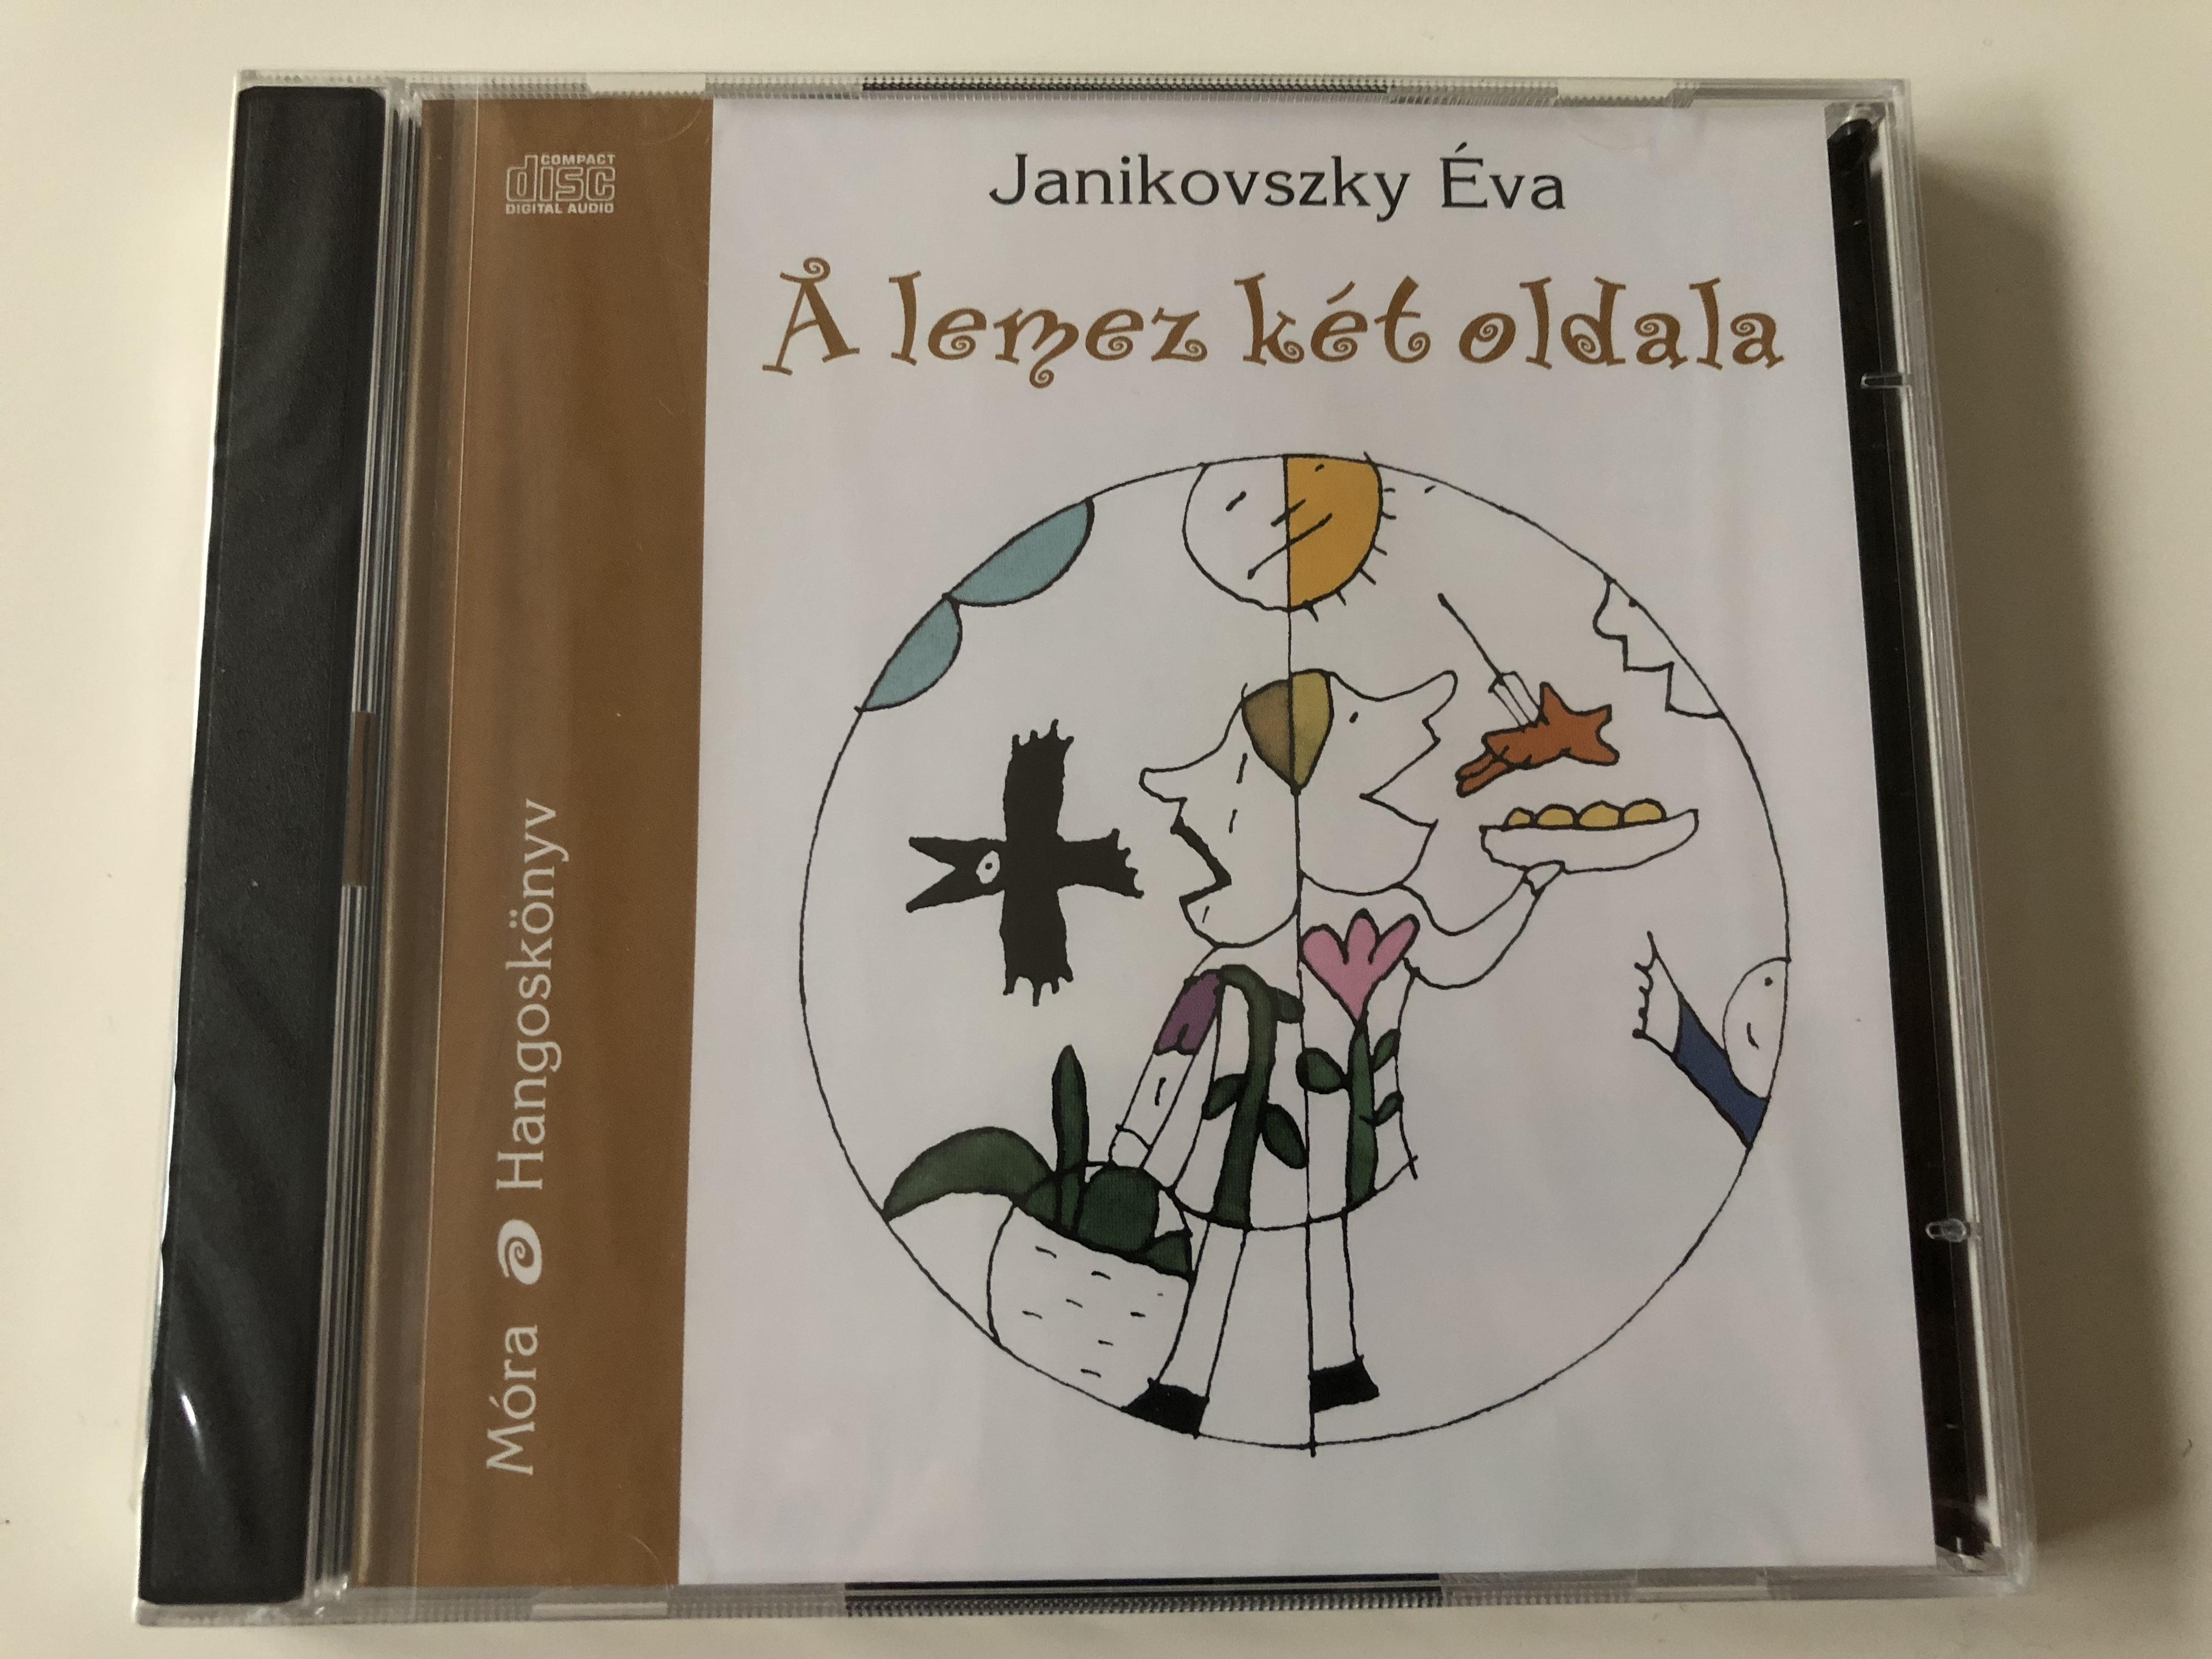 a-lemez-k-t-oldala-by-janikovszky-va-hungarian-language-audio-book-read-by-p-csi-ildik-2x-audio-cd-2007-m-ra-hangosk-nyv-2-.jpg